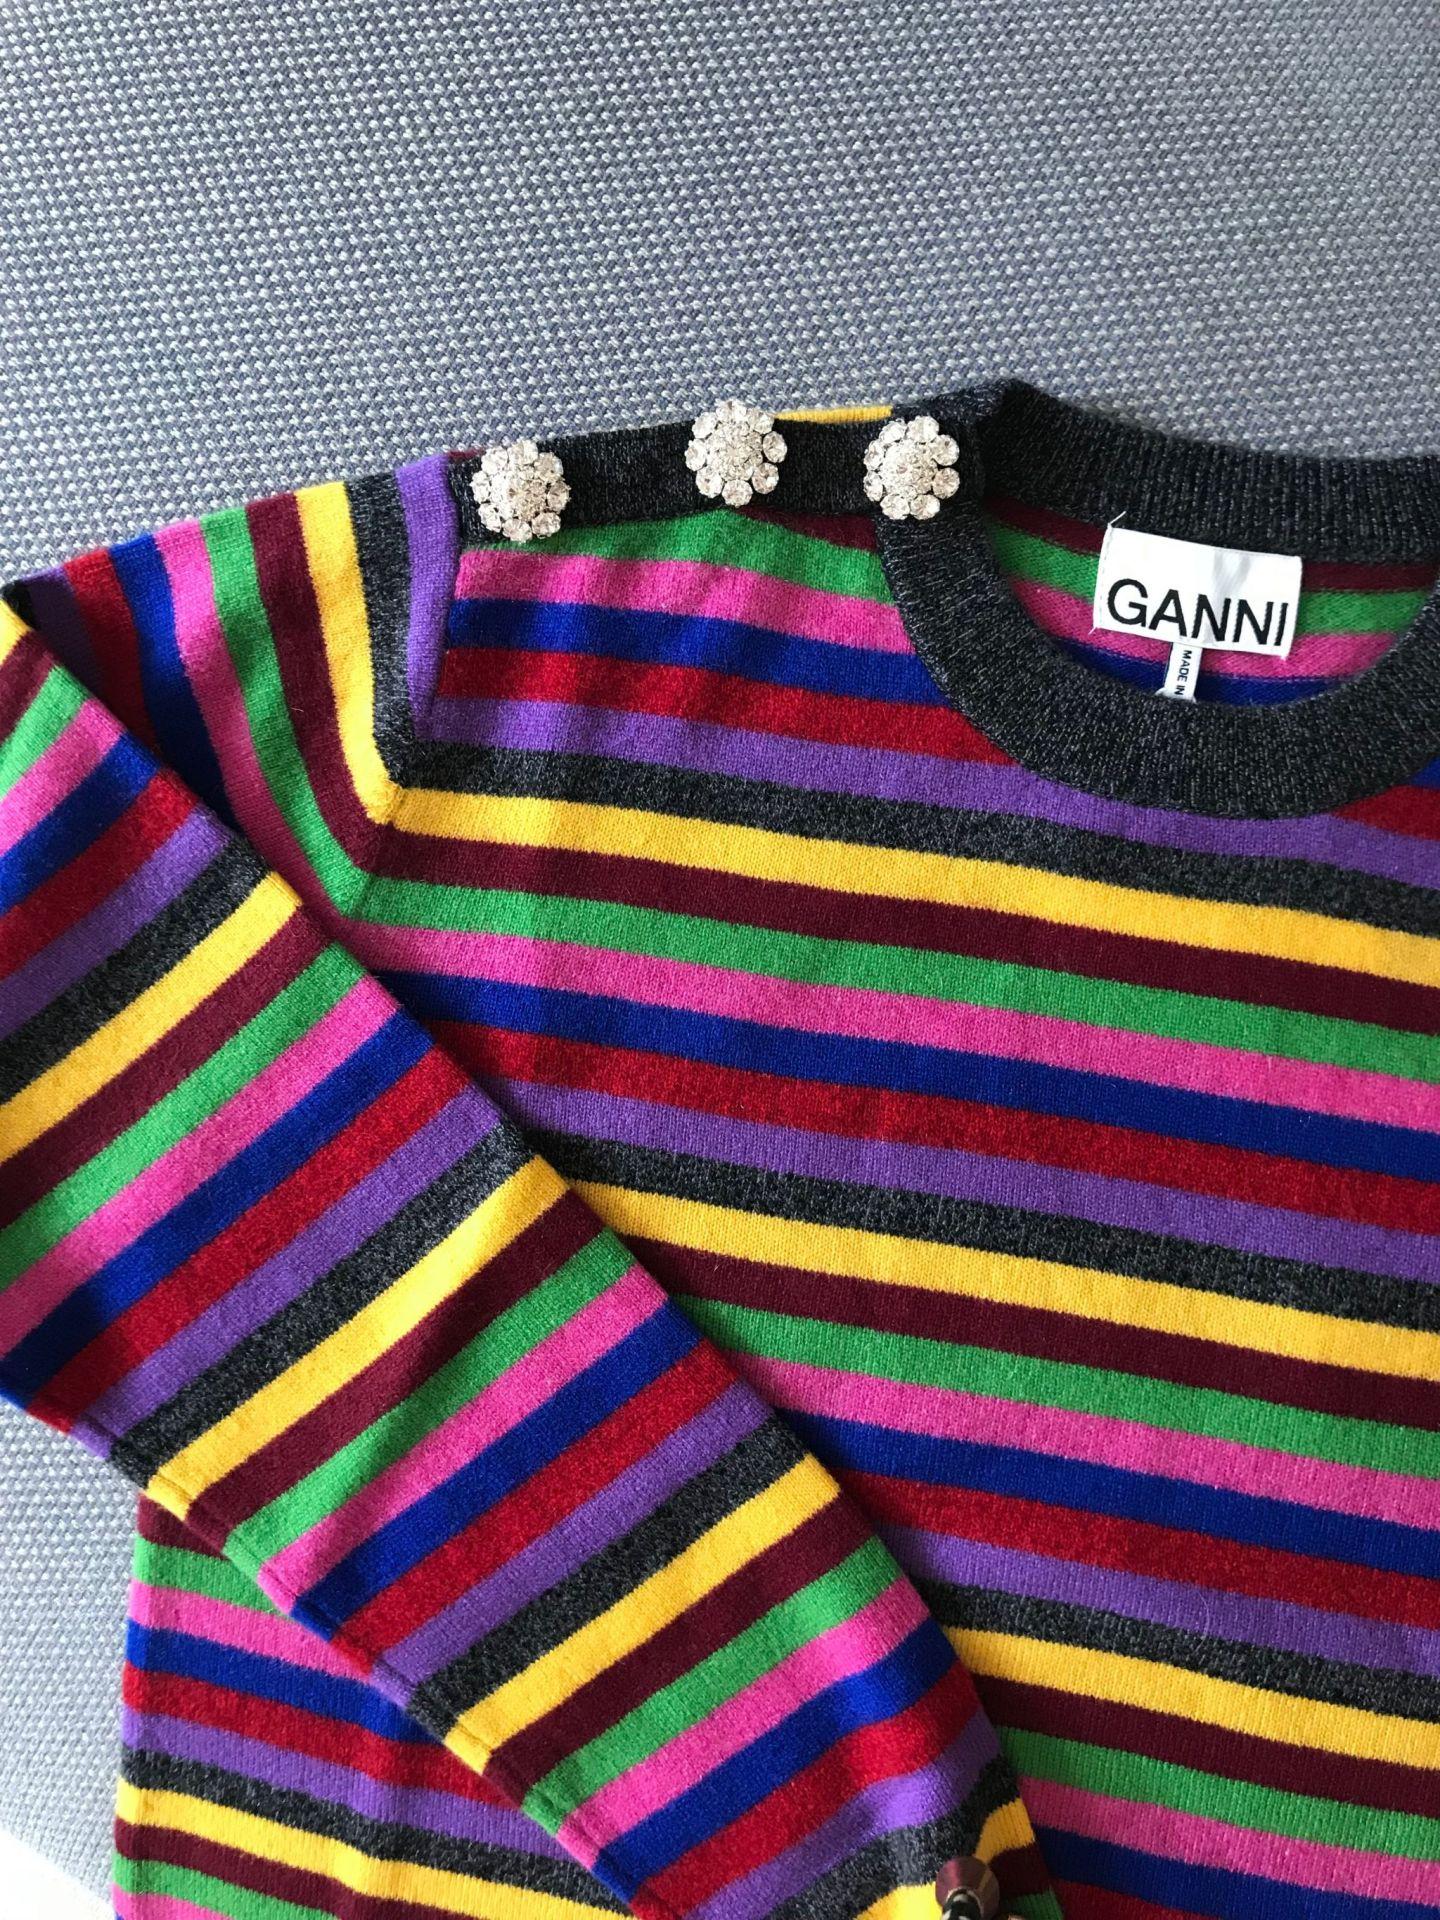 alexa-peng-ganni-pullover-2